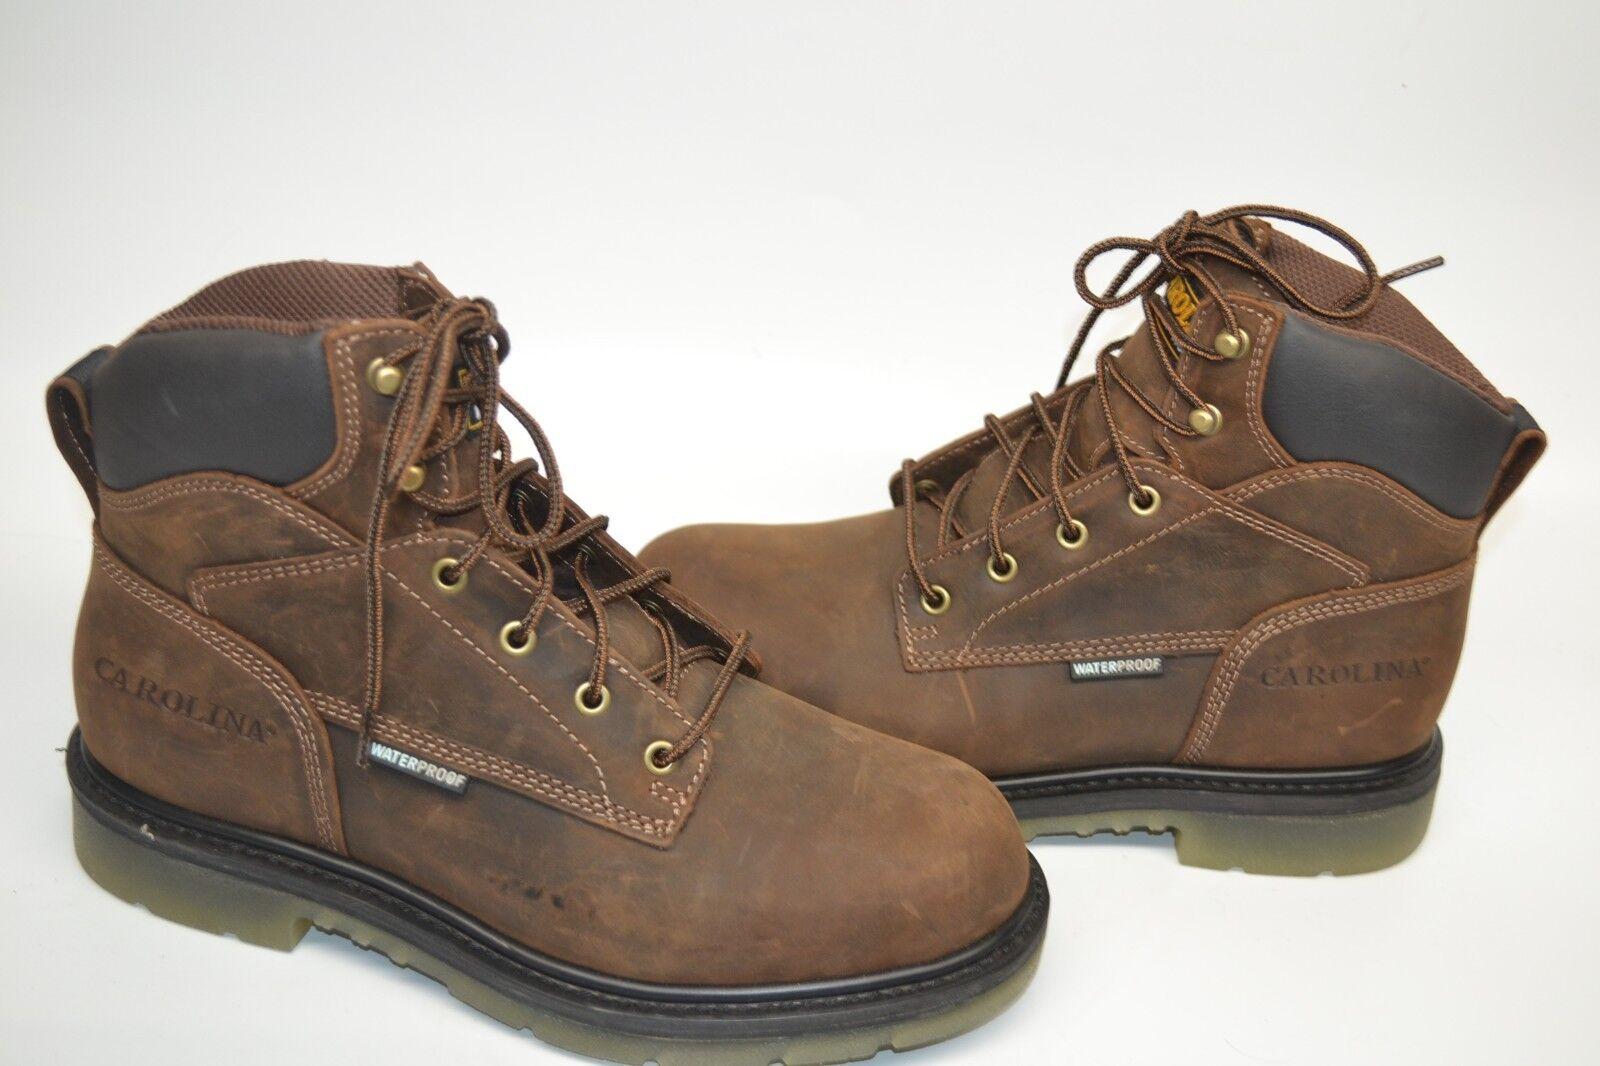 Carolina CA7120 Brown Leather Waterproof 6   SOFT Toe Work Boot 9 D MEMORY FOAM